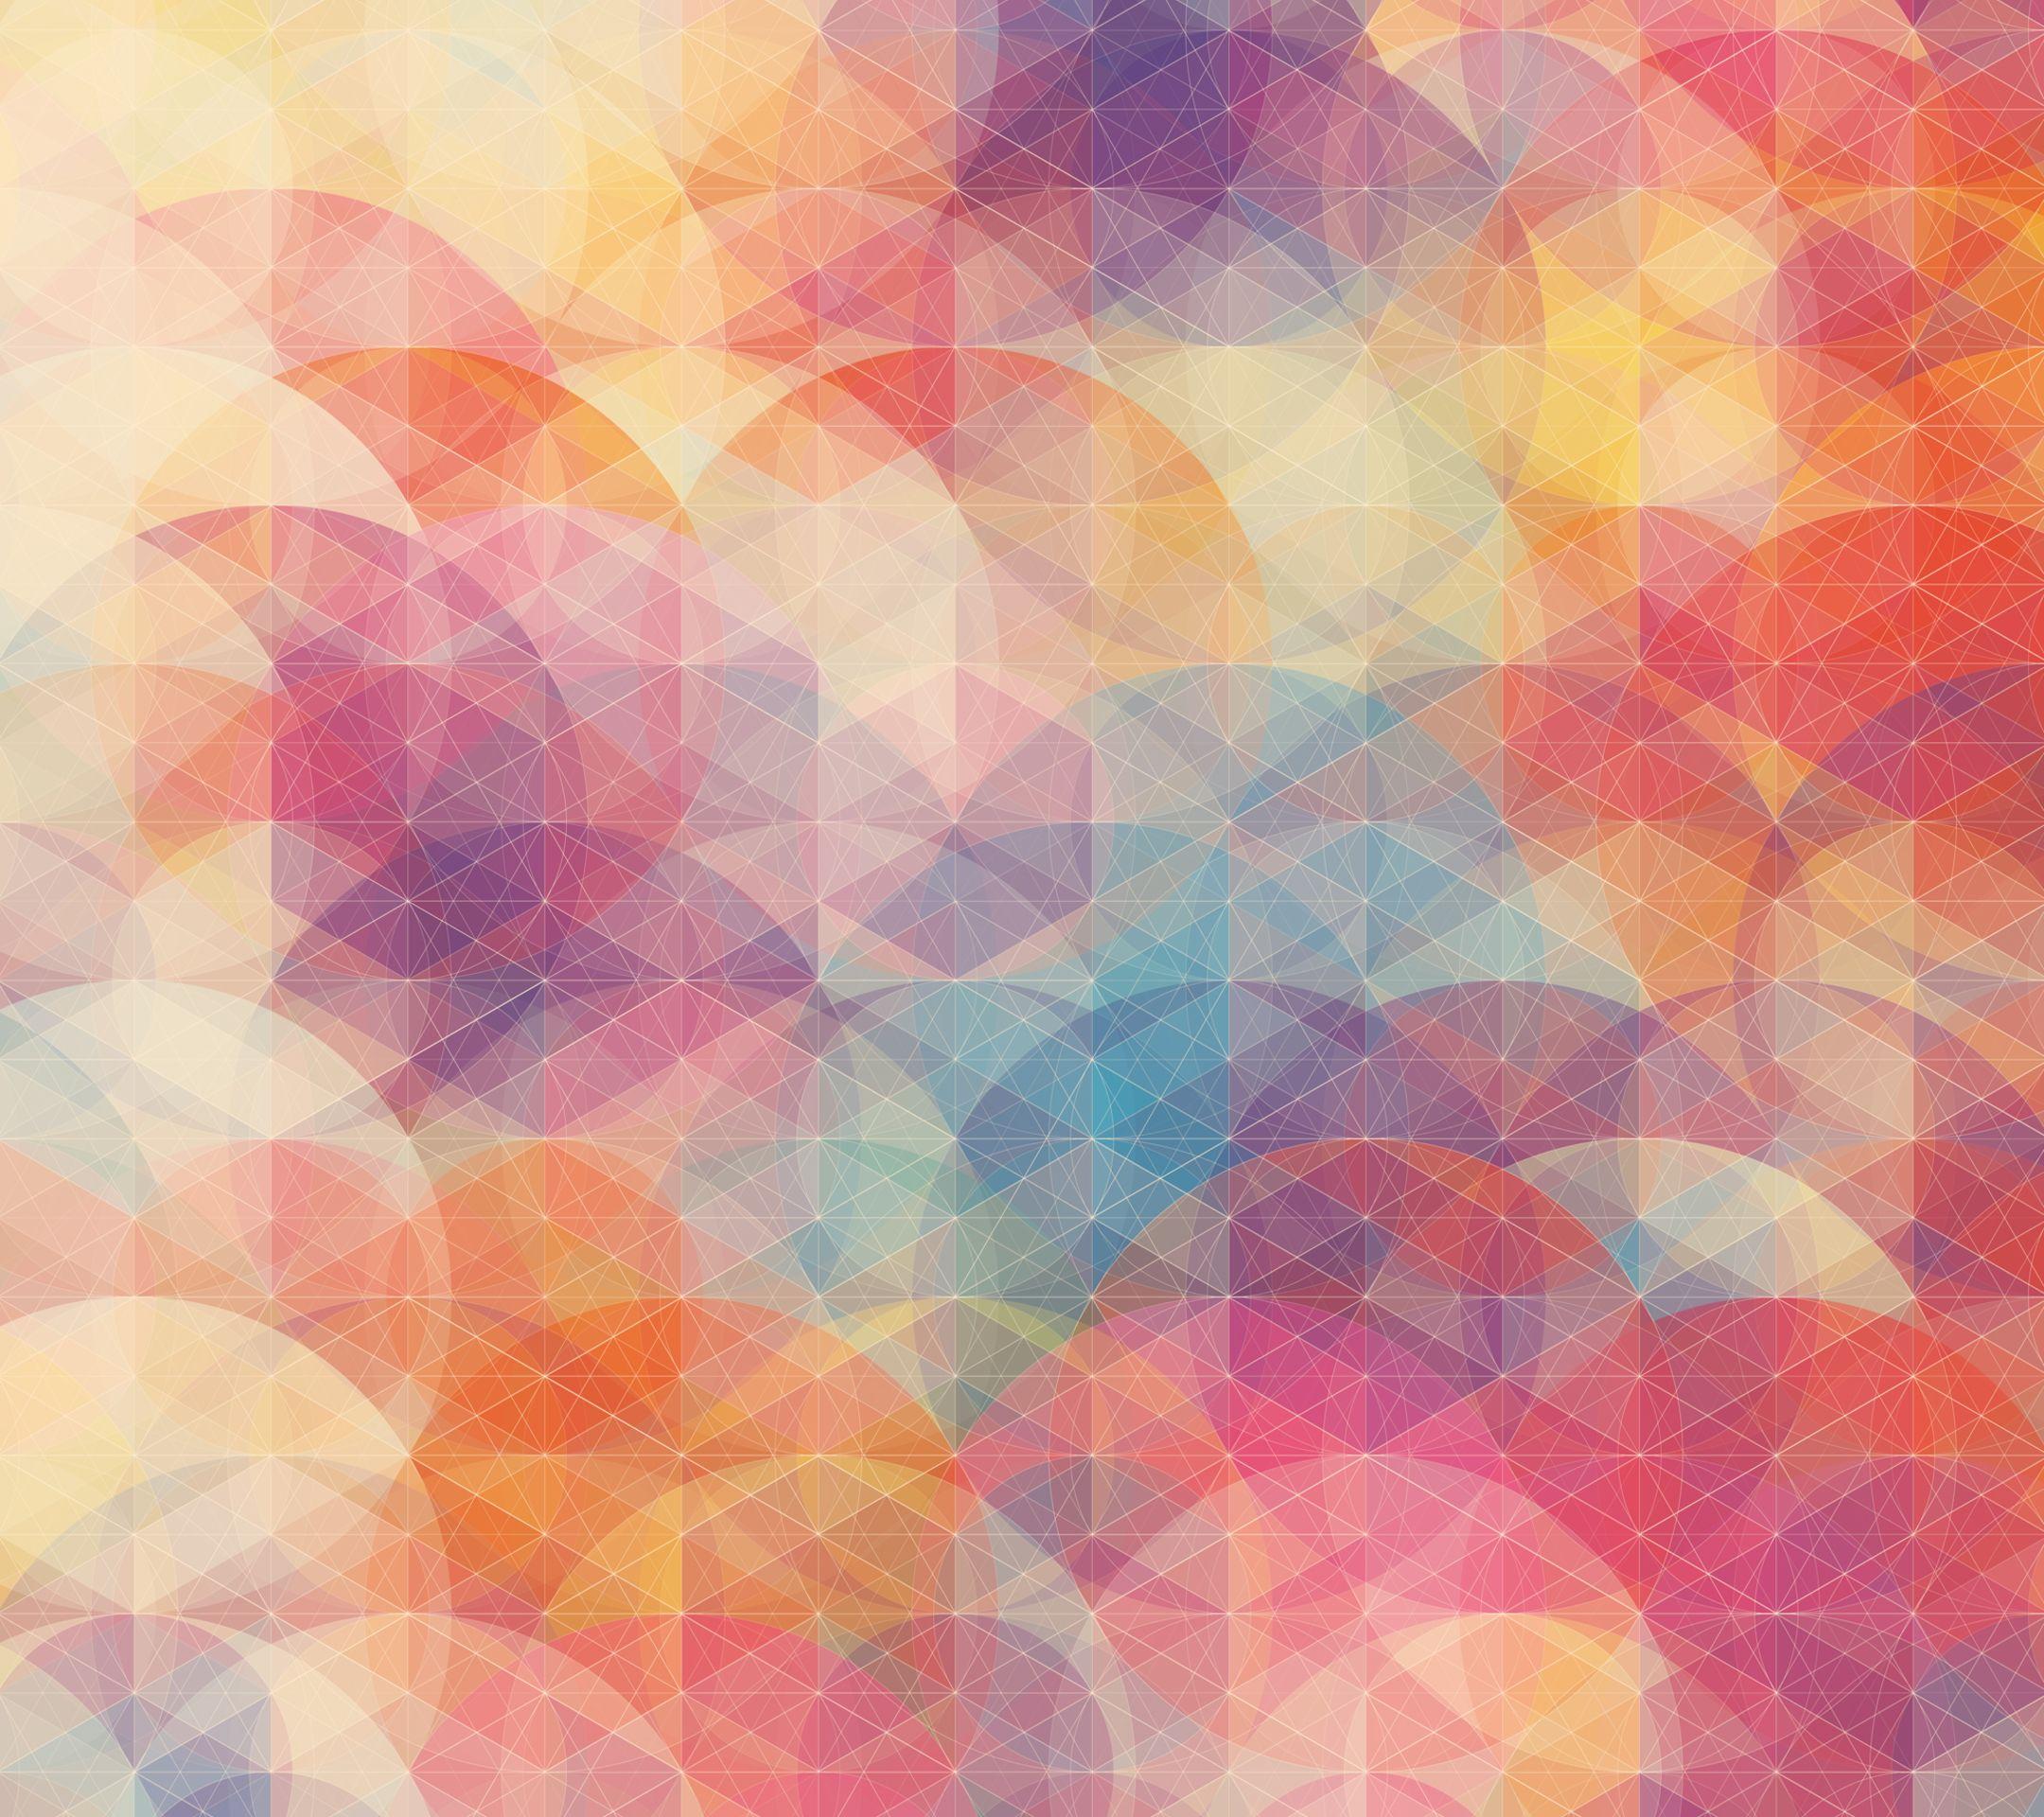 Tumblr iphone wallpaper pattern - Background Tumblr Pattern Google Keres S Iphone 6 Wallpaperwallpaper